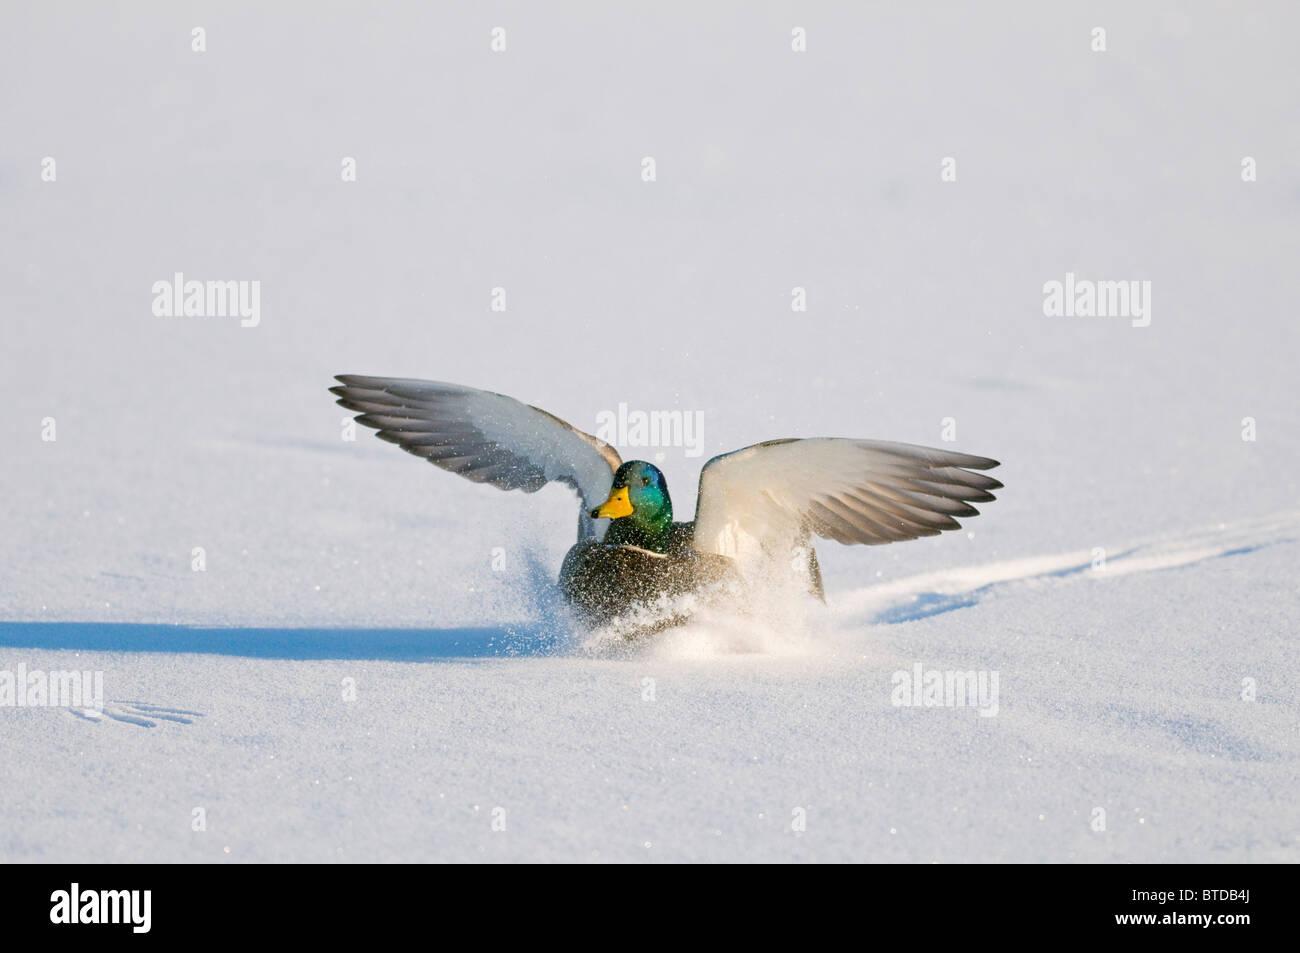 Mallard drake with wings extended lands in snow near Chena River, Fairbanks, Interior Alaska, Winter, Digitally Stock Photo